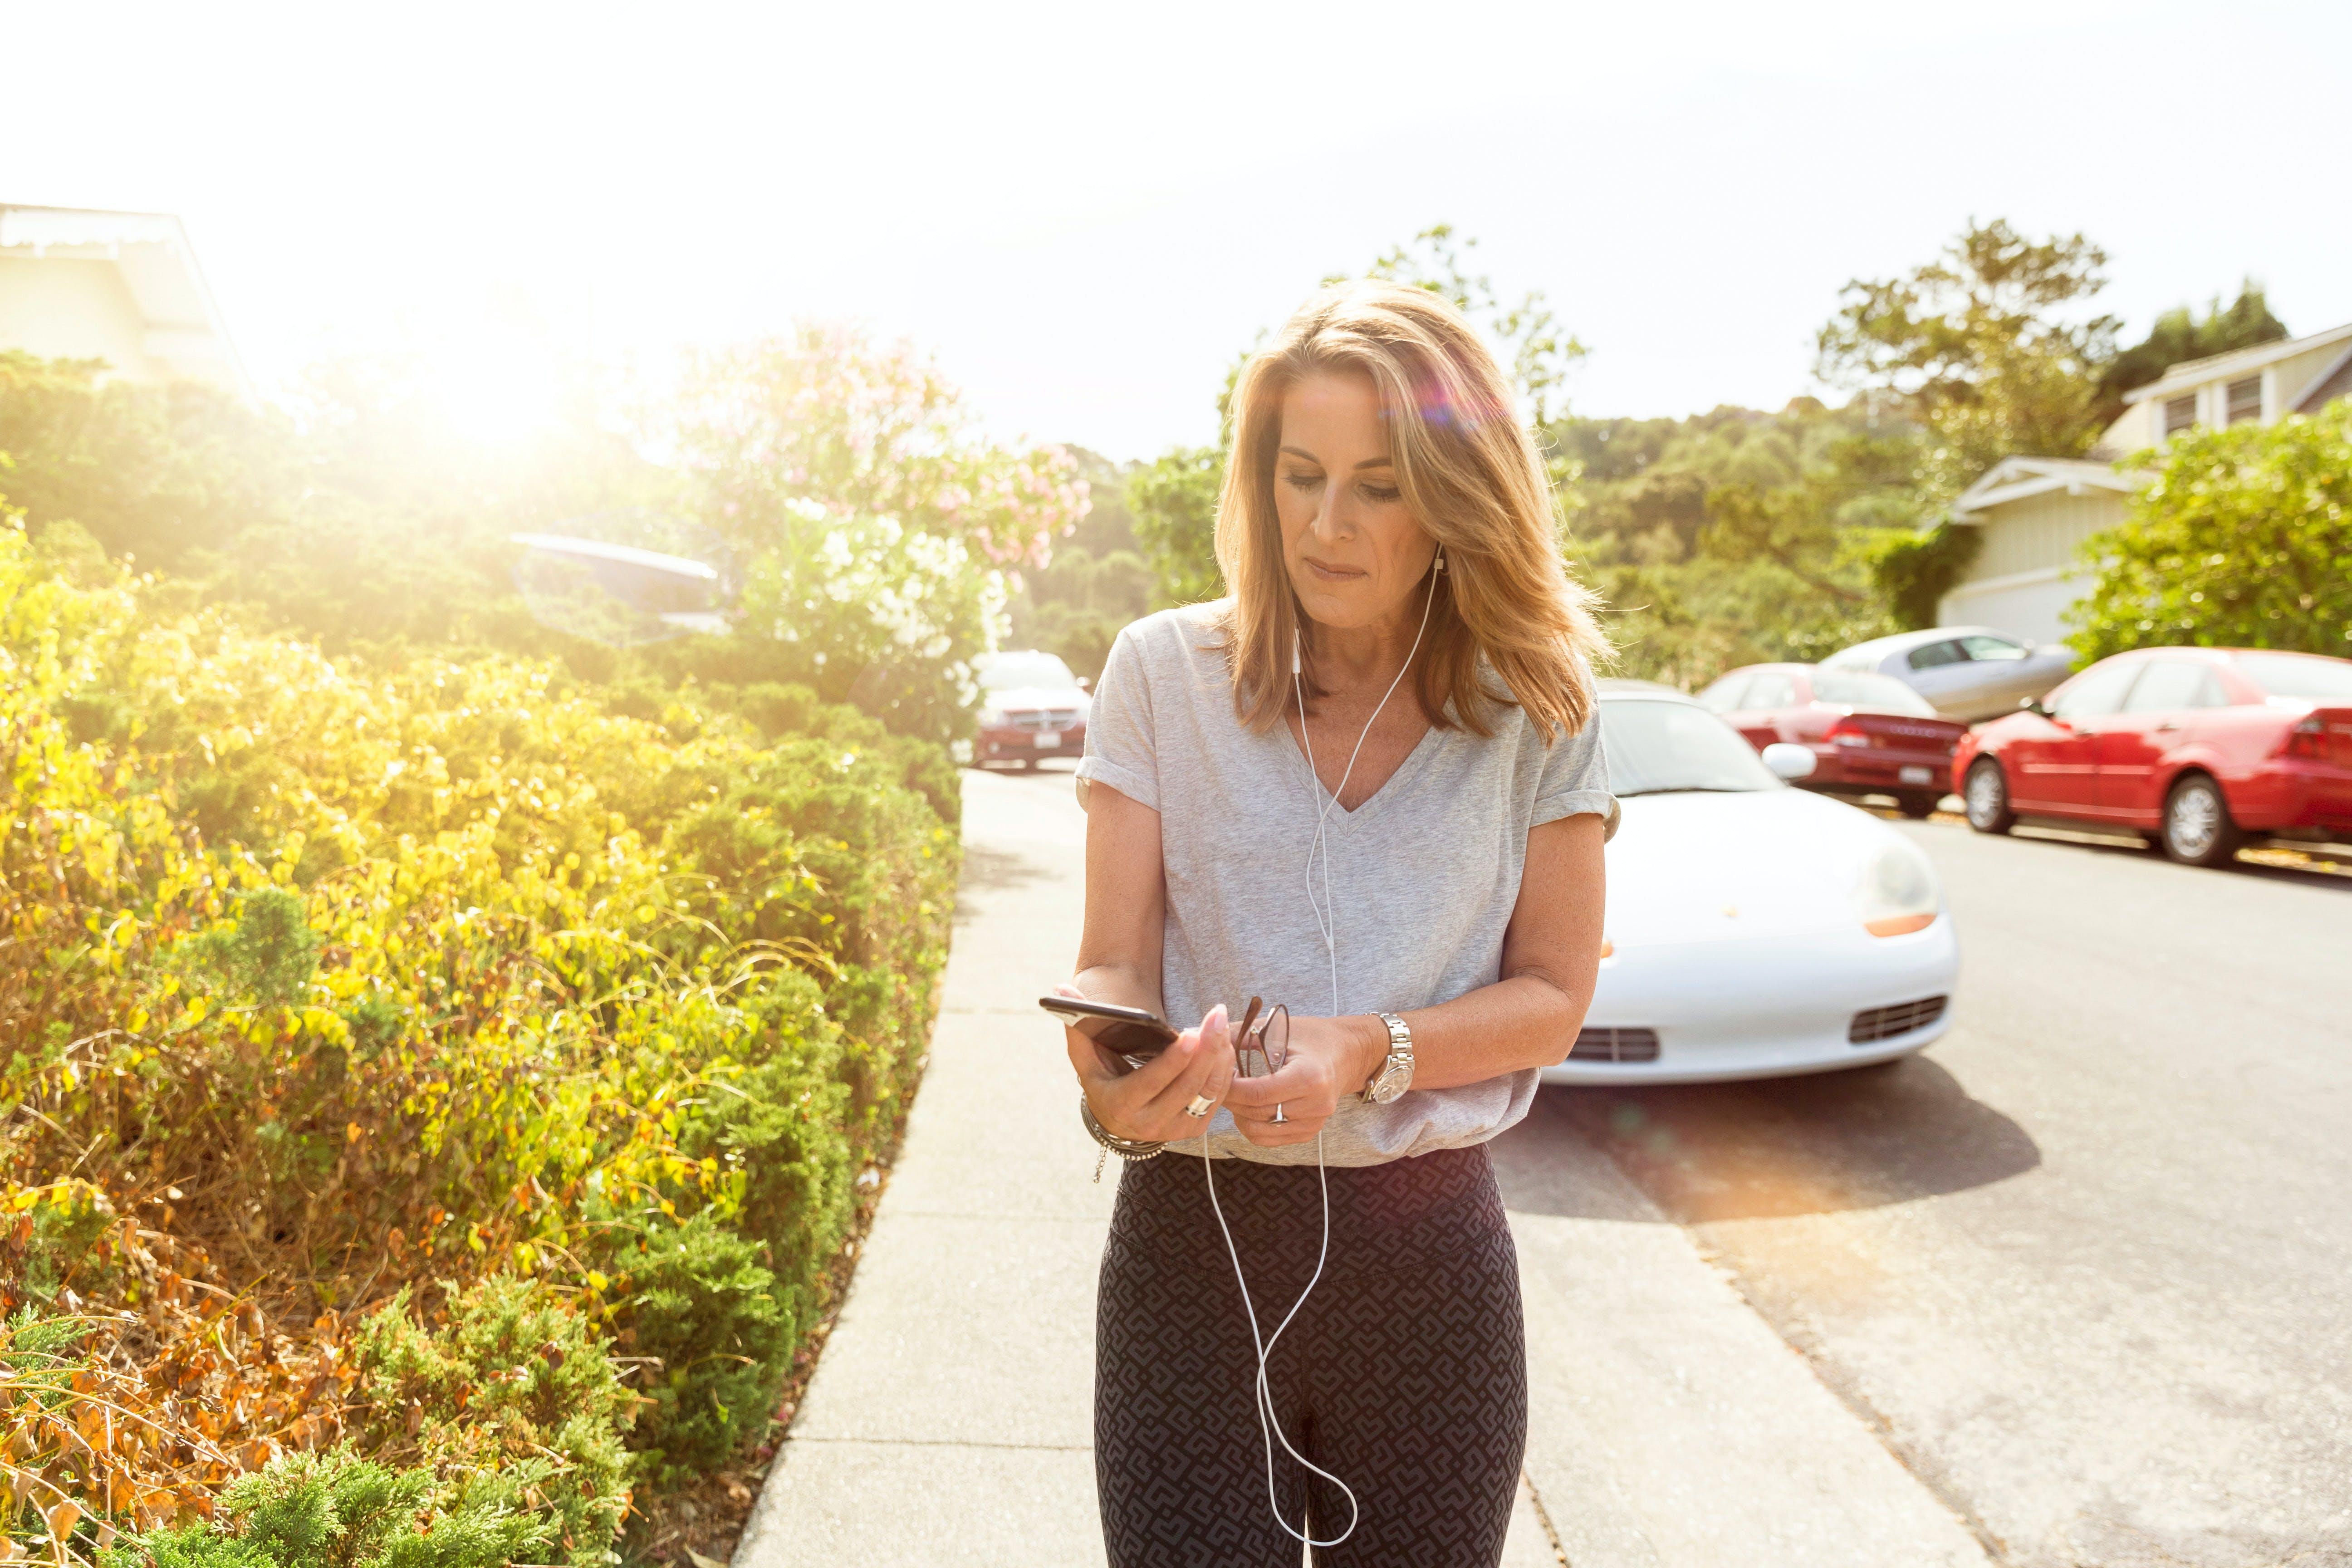 Women in Grey Shirt While Using Smartphone